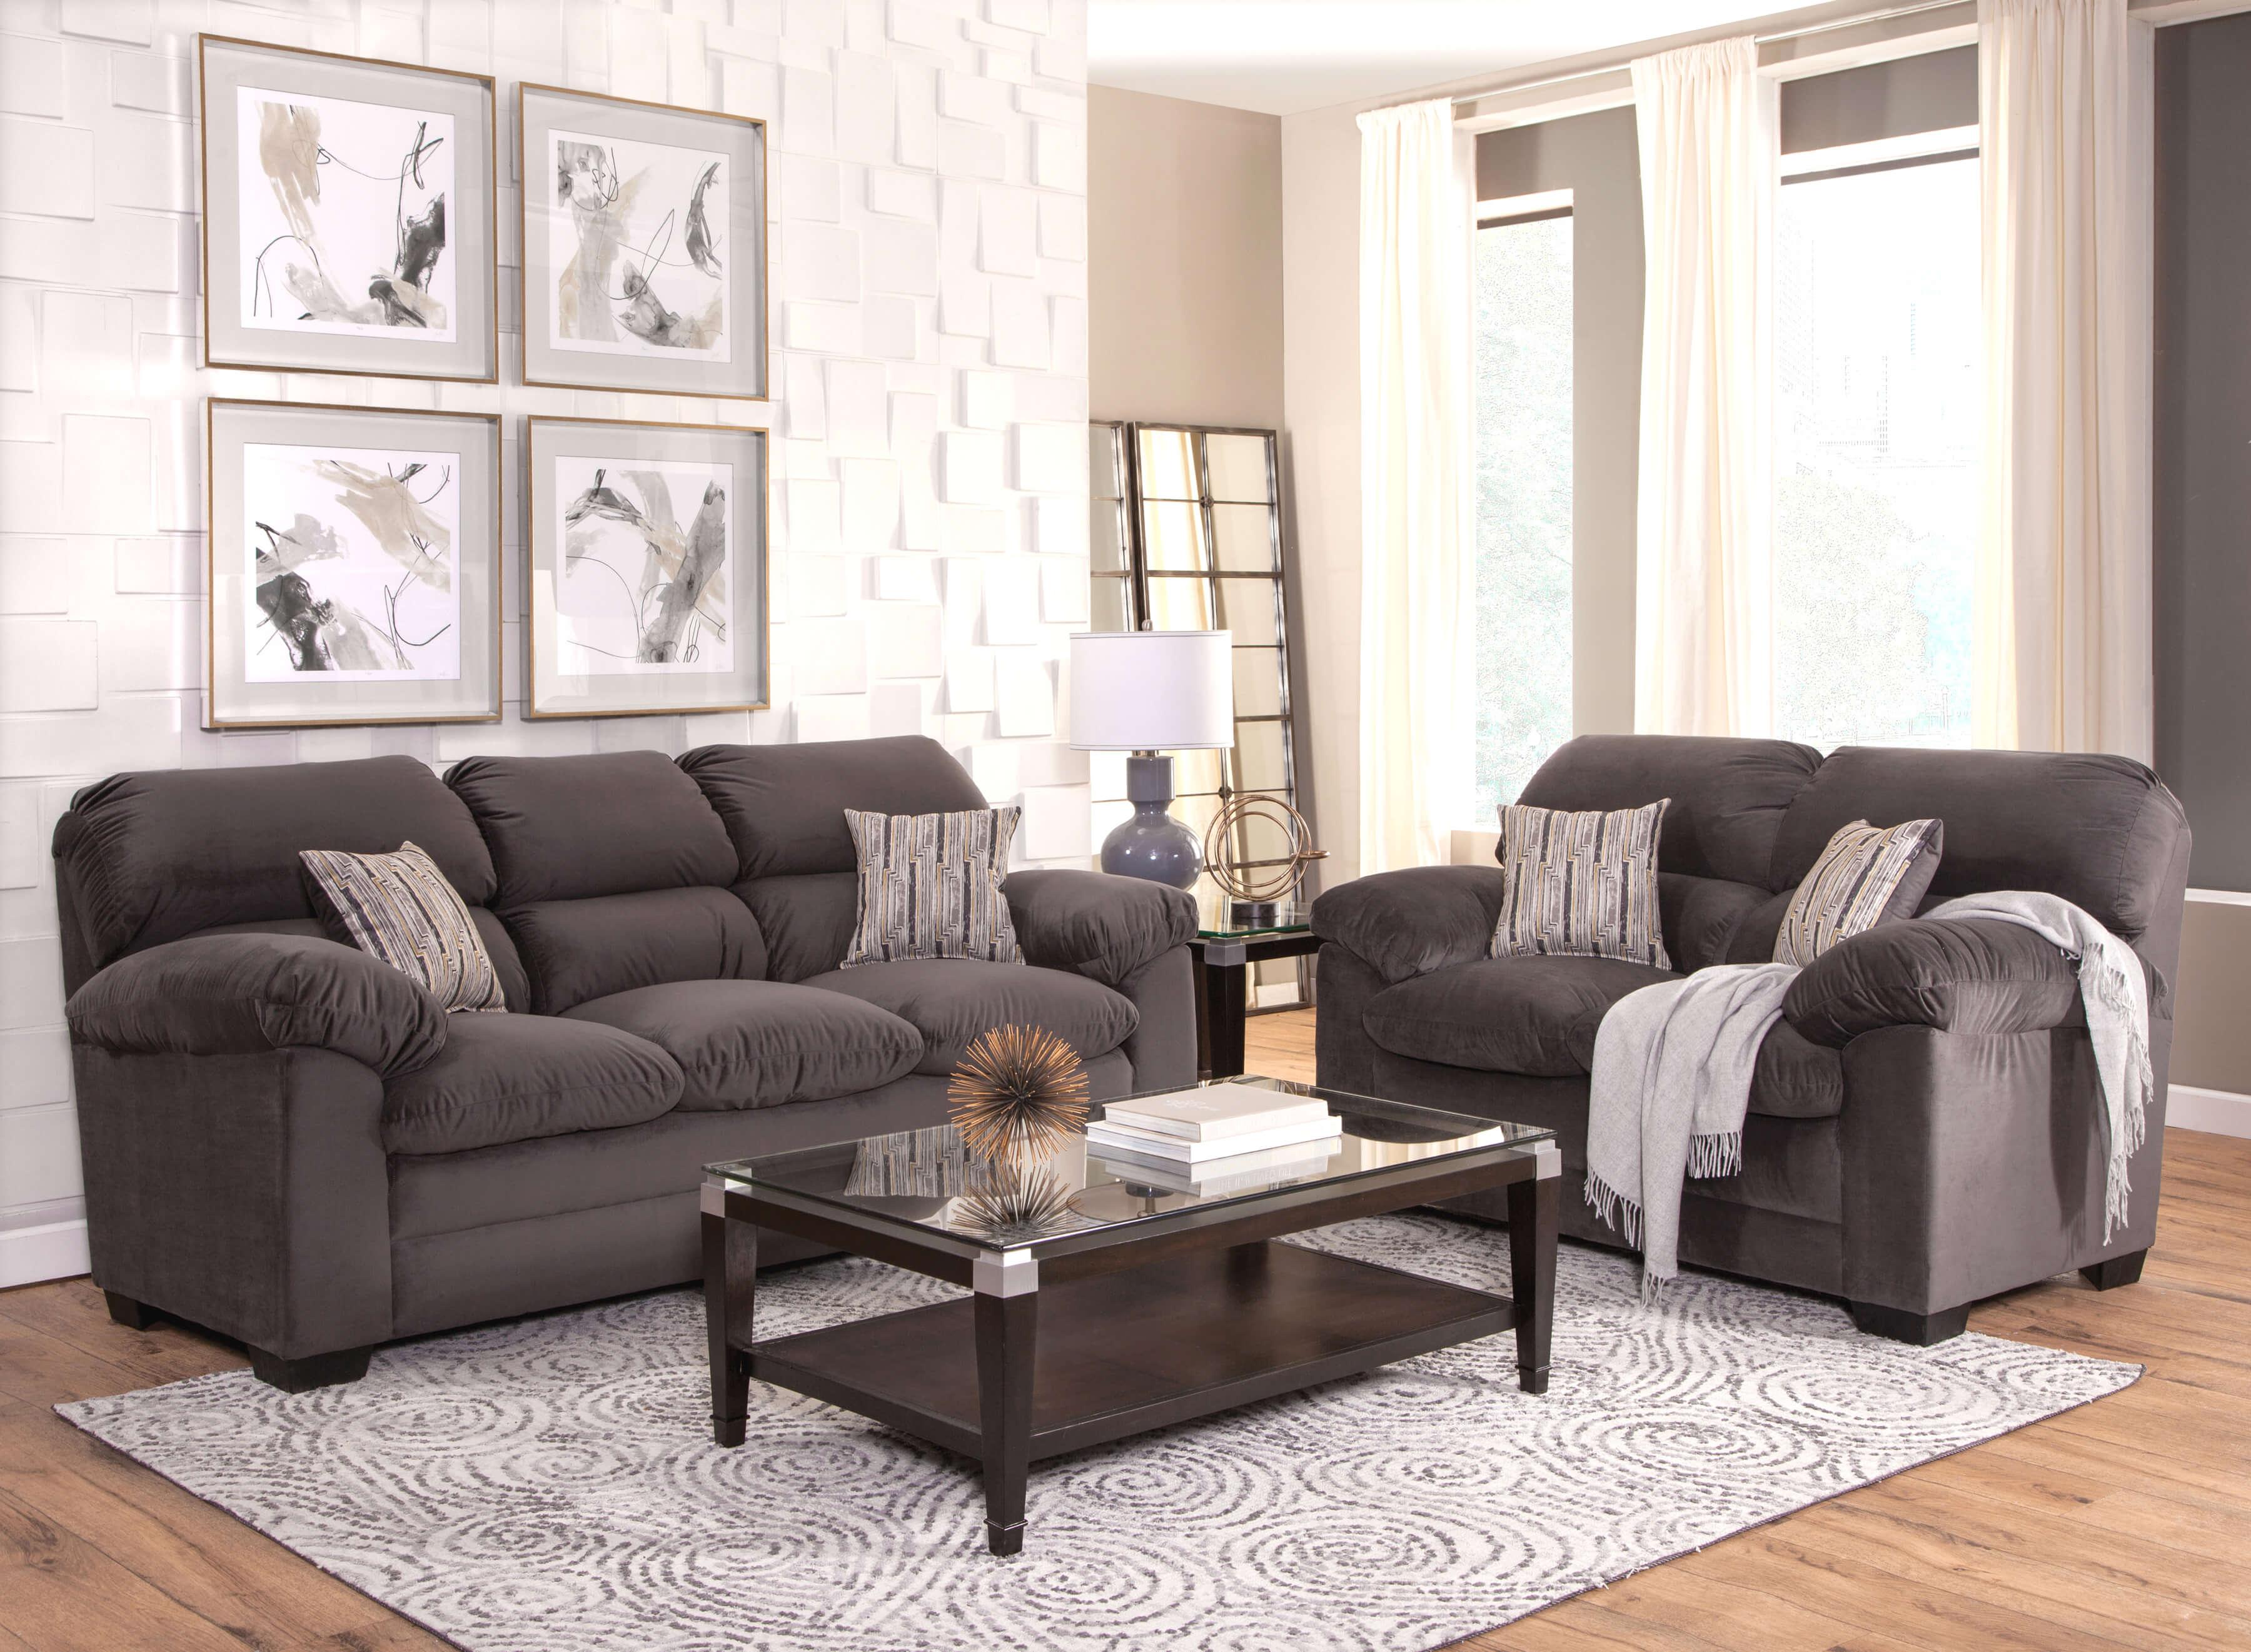 Cleanline Sofa Sets: Alta Plush Pepper Sofa And Loveseat